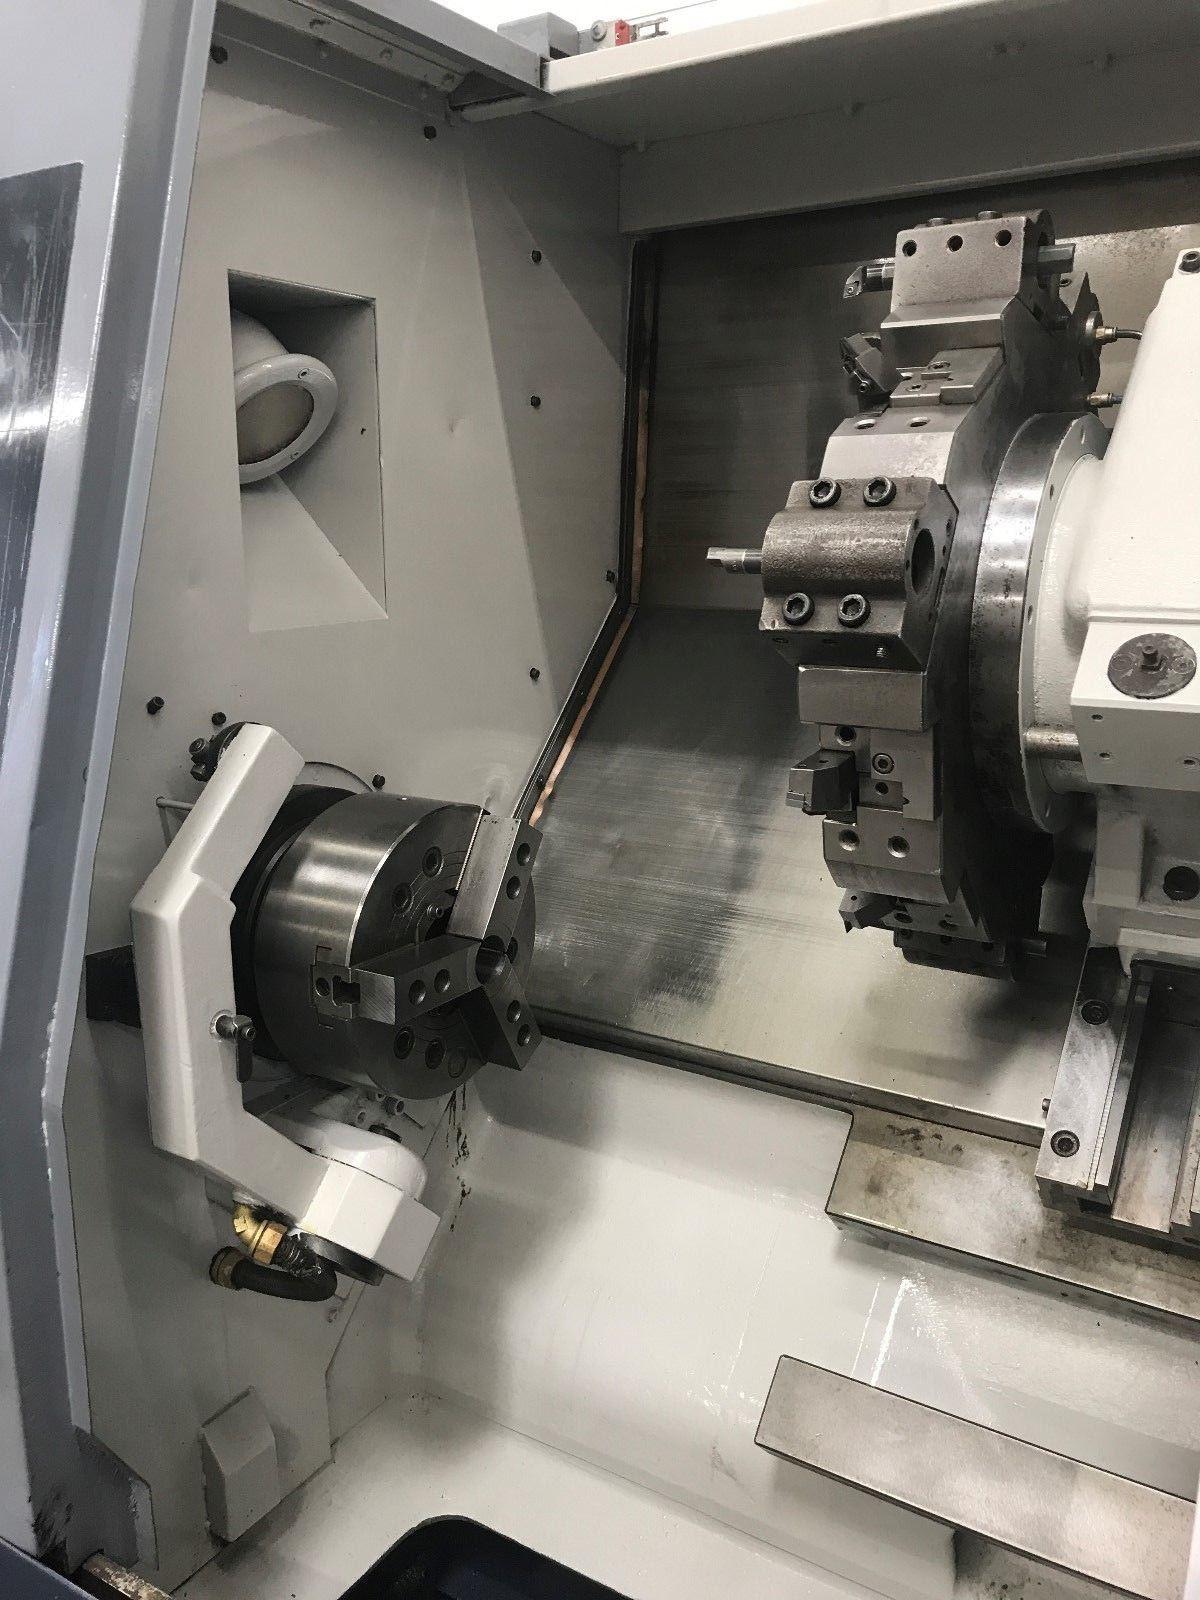 Mori Seiki SL-25B/500 CNC Turning Center - MachineStation